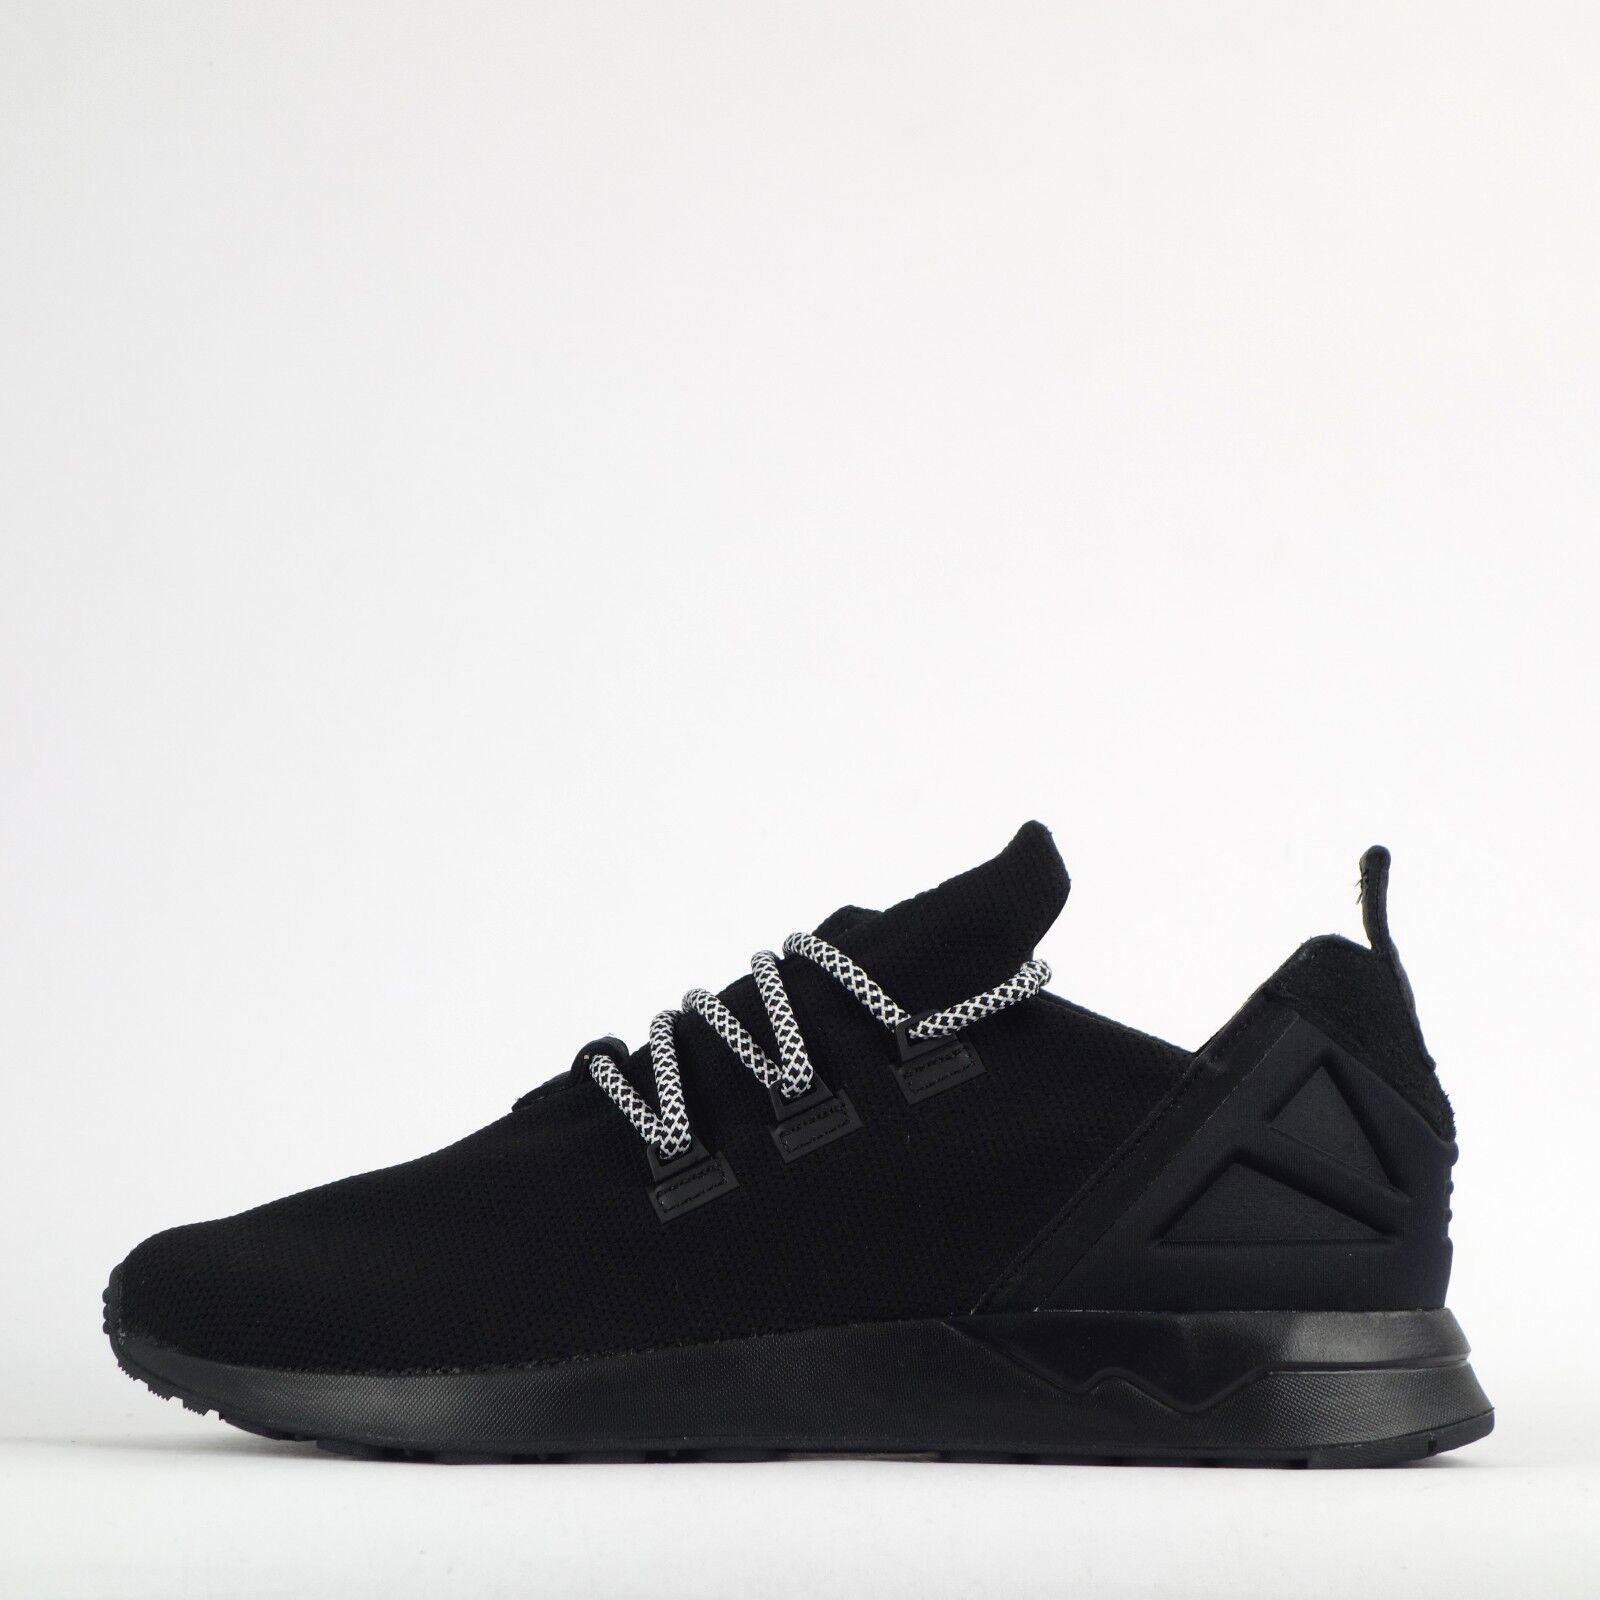 adidas Originals ZX Flux ADV X homme Casual Trainers chaussures noir